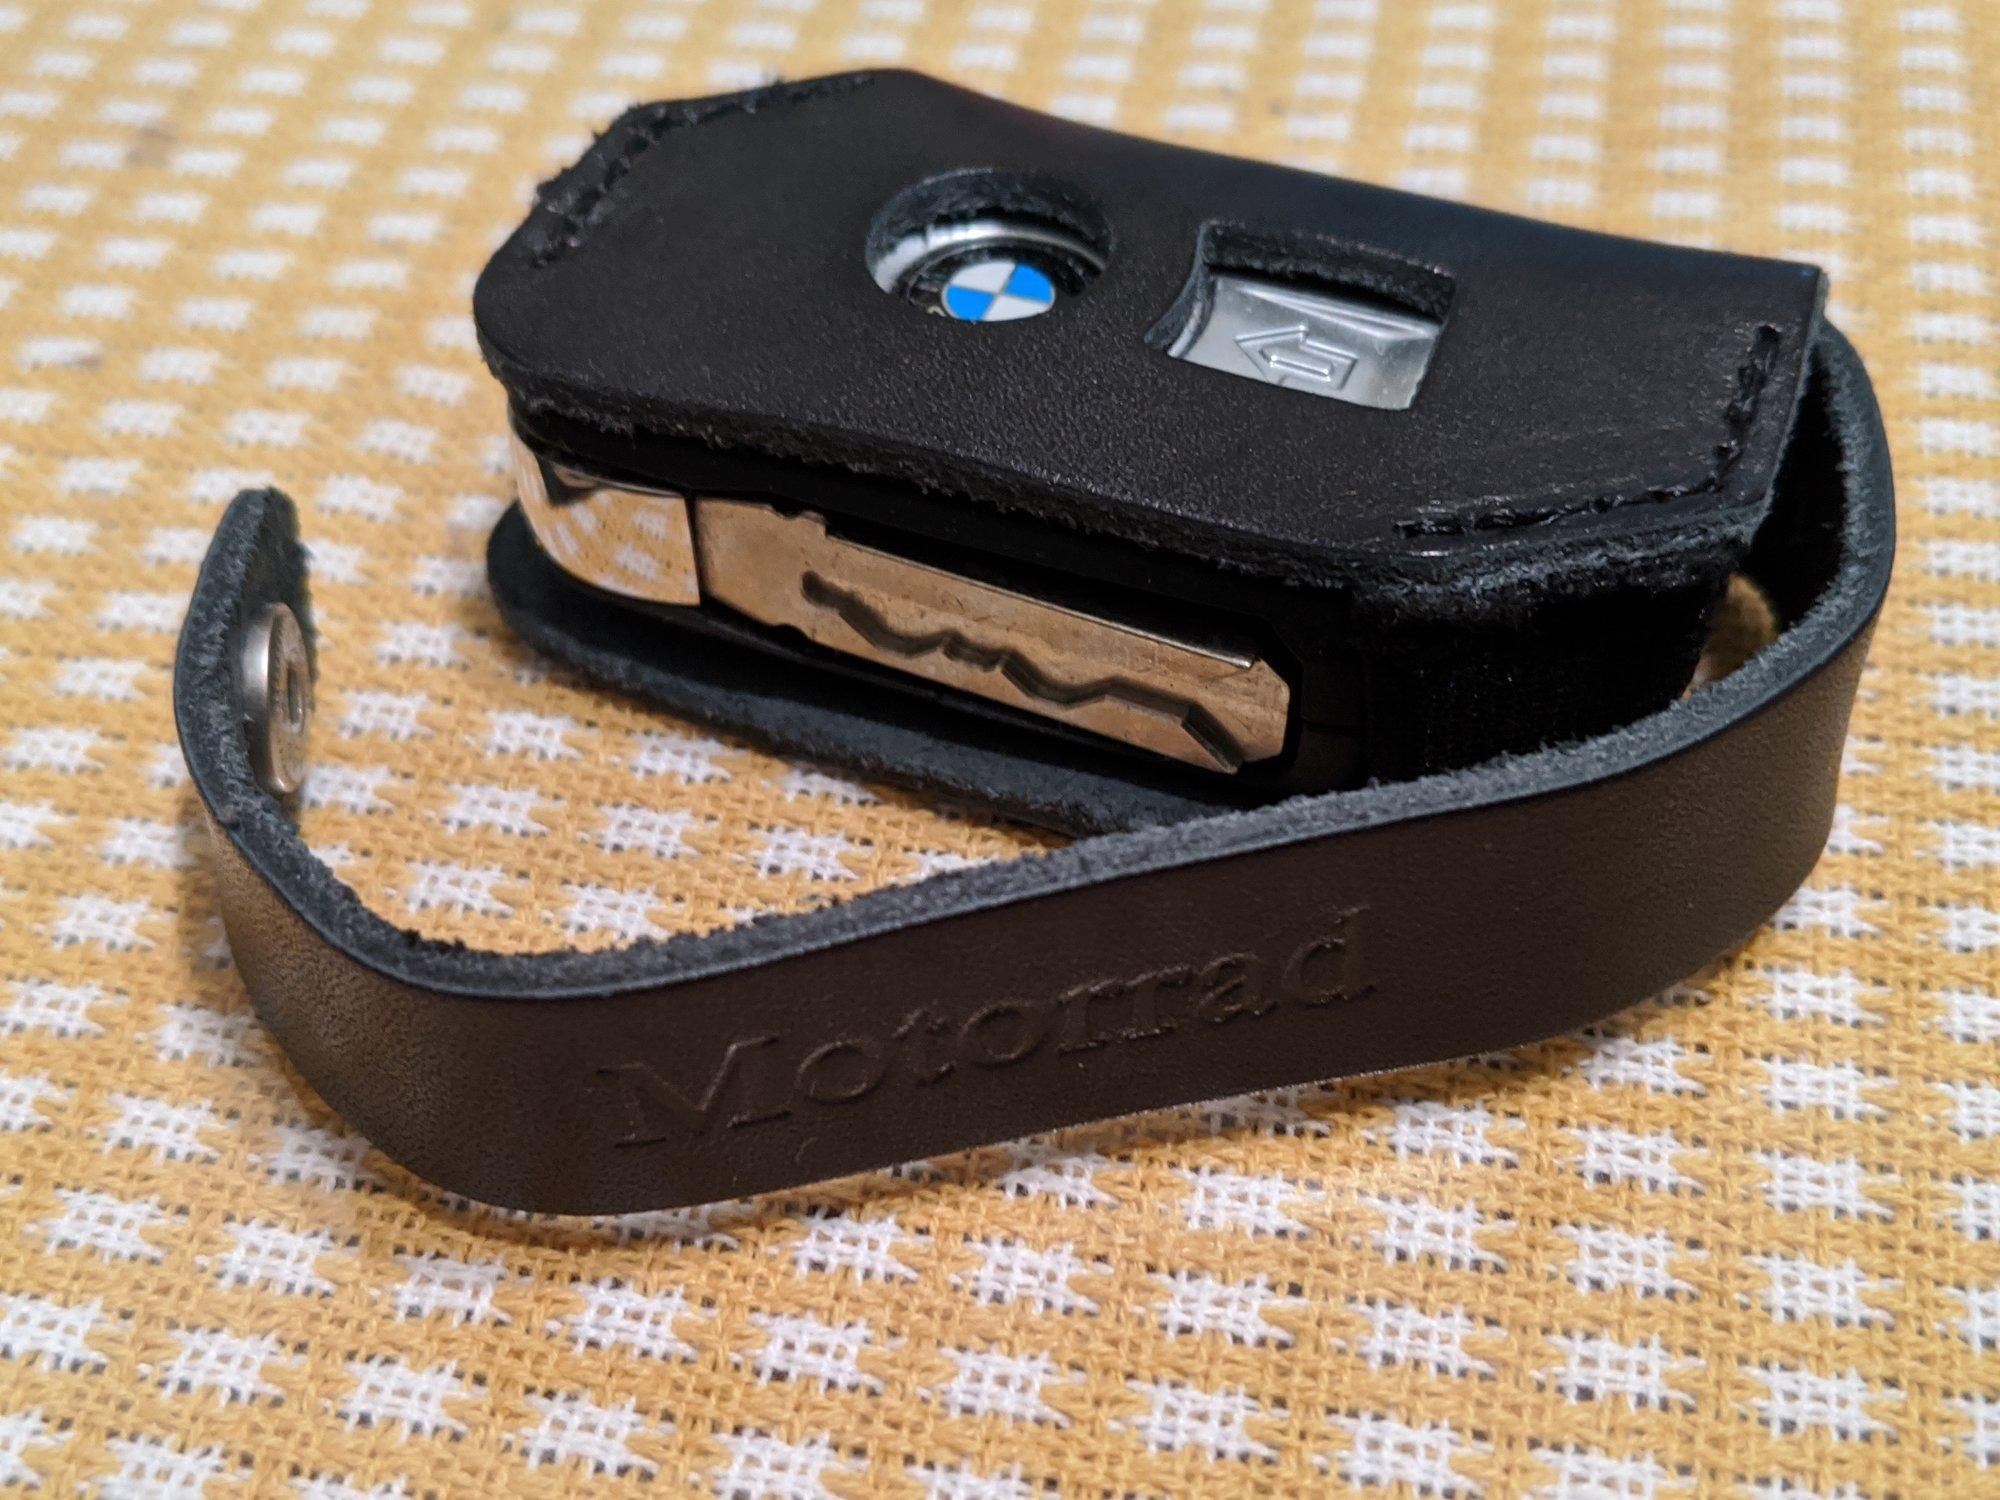 BMW key.jpg